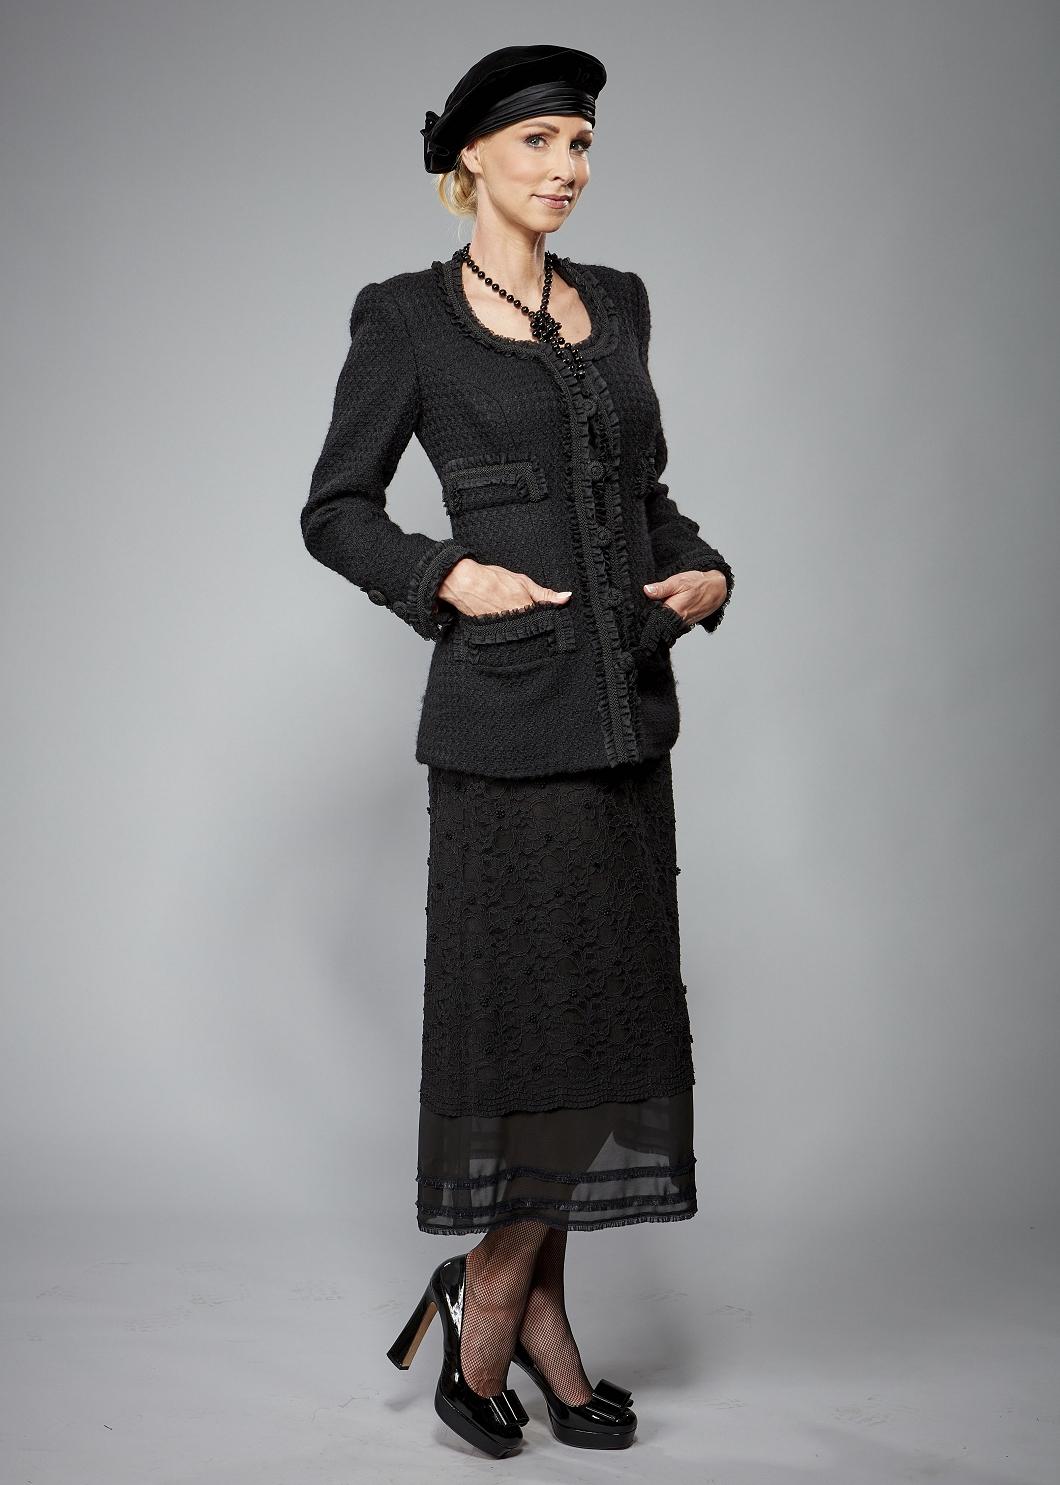 Tages-/Business-Bekleidung Haute Couture Privée Christina Kreuz